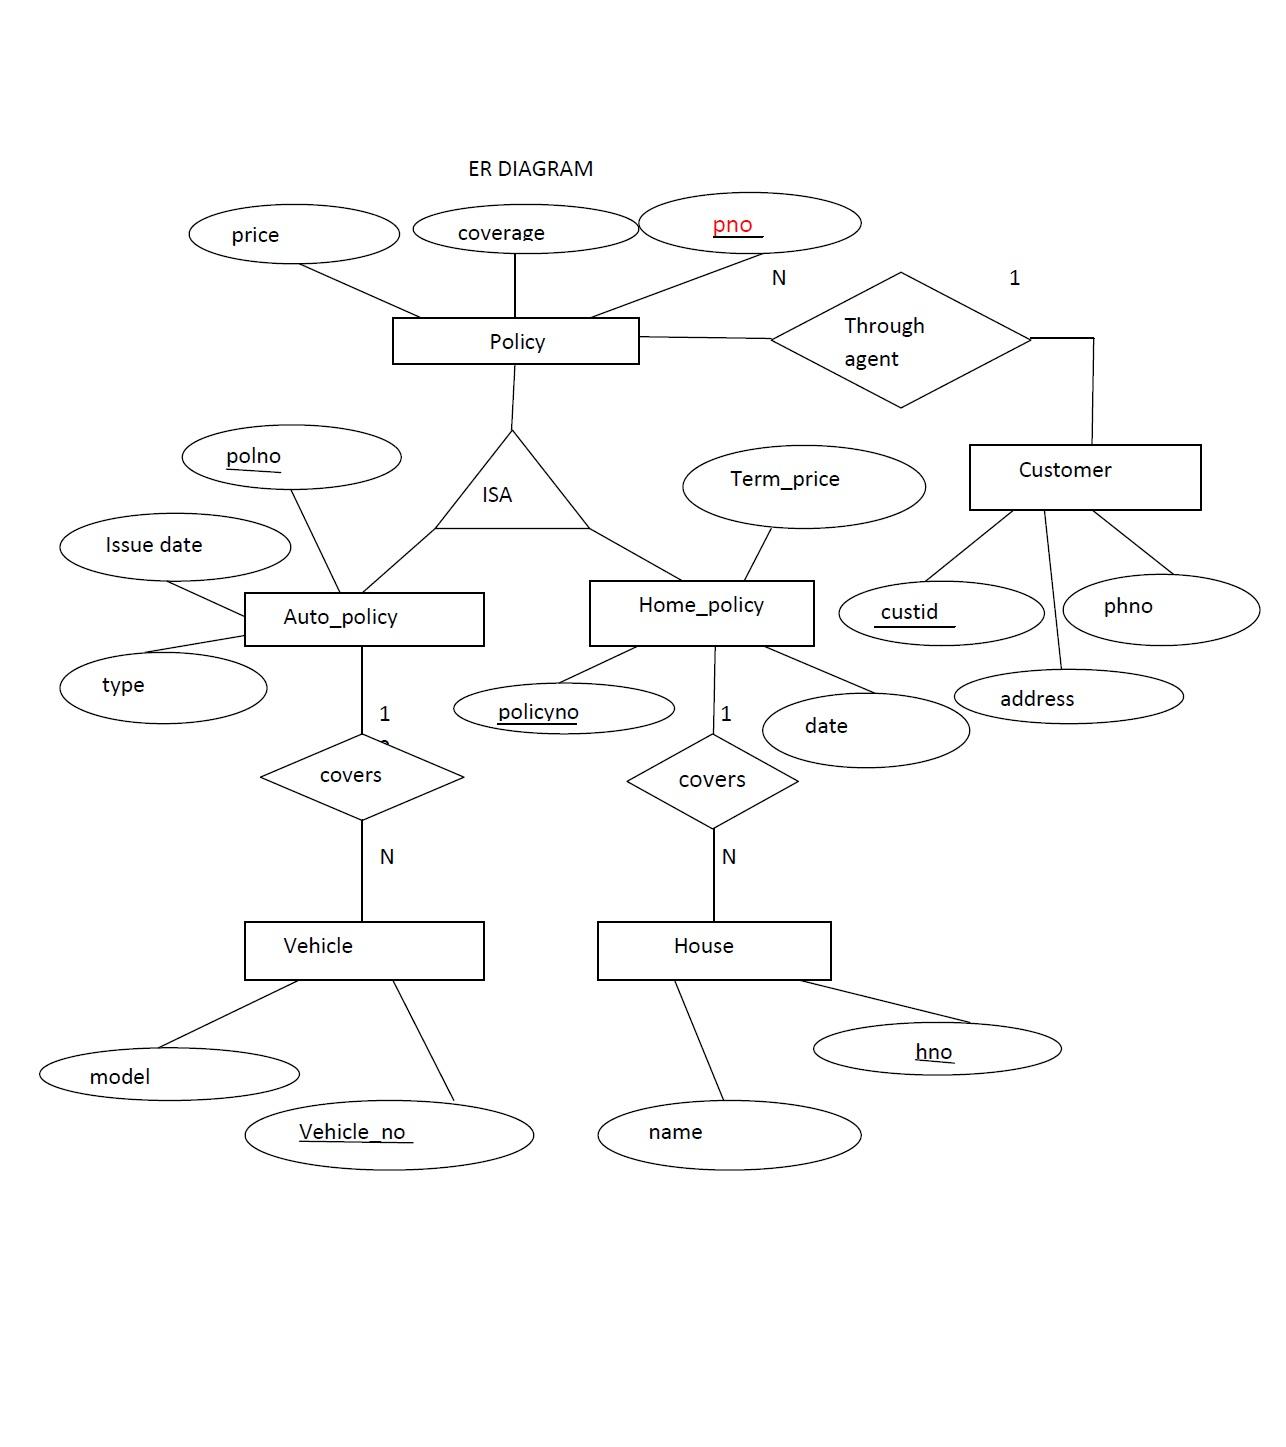 Extended Er-Diagram (Insurance Company) Roll No; 29 S5Cs2 with regard to Er Diagram Car